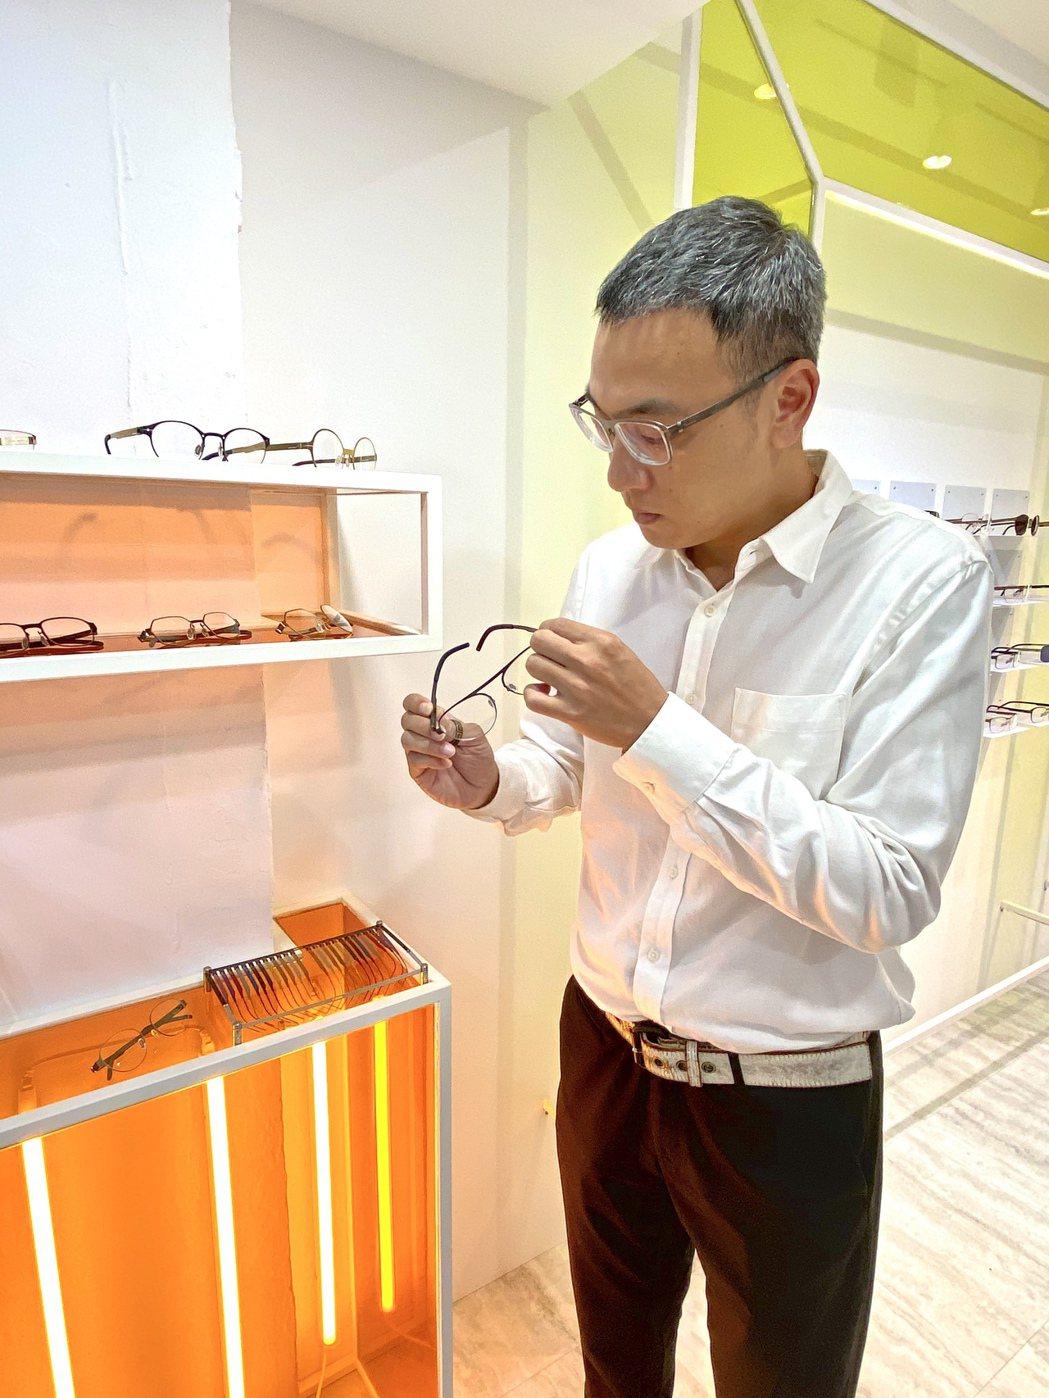 mAh品牌總監陳冠吾解釋,mAh客製化眼鏡與一般傳統眼鏡的差異。圖/業者提供